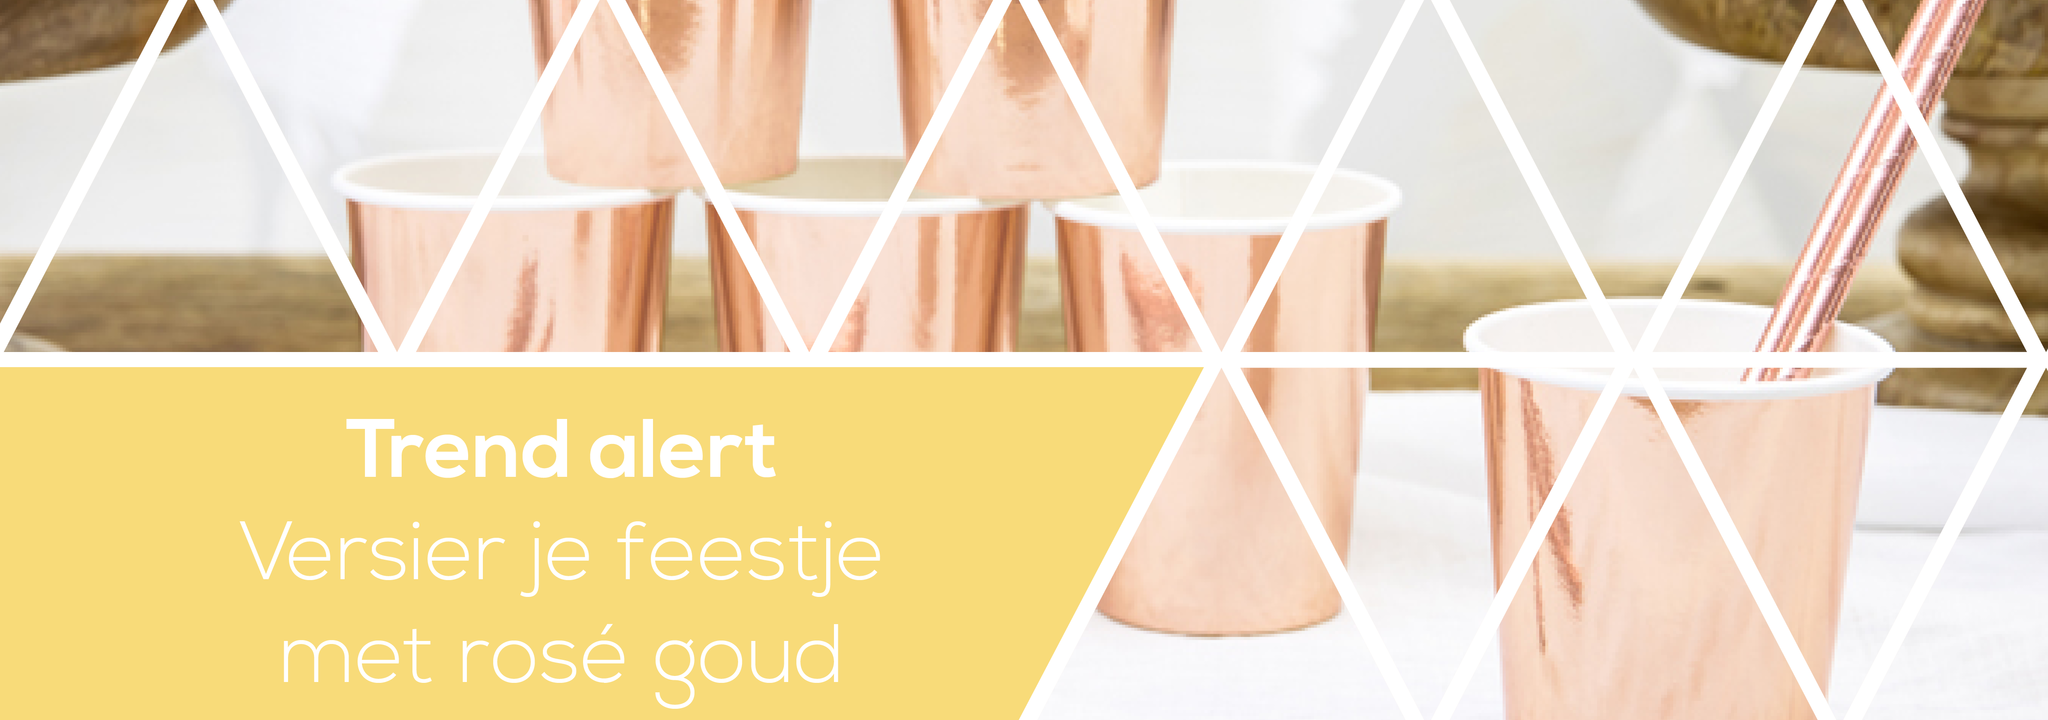 Trend alert: versier je feestje met rosé goud